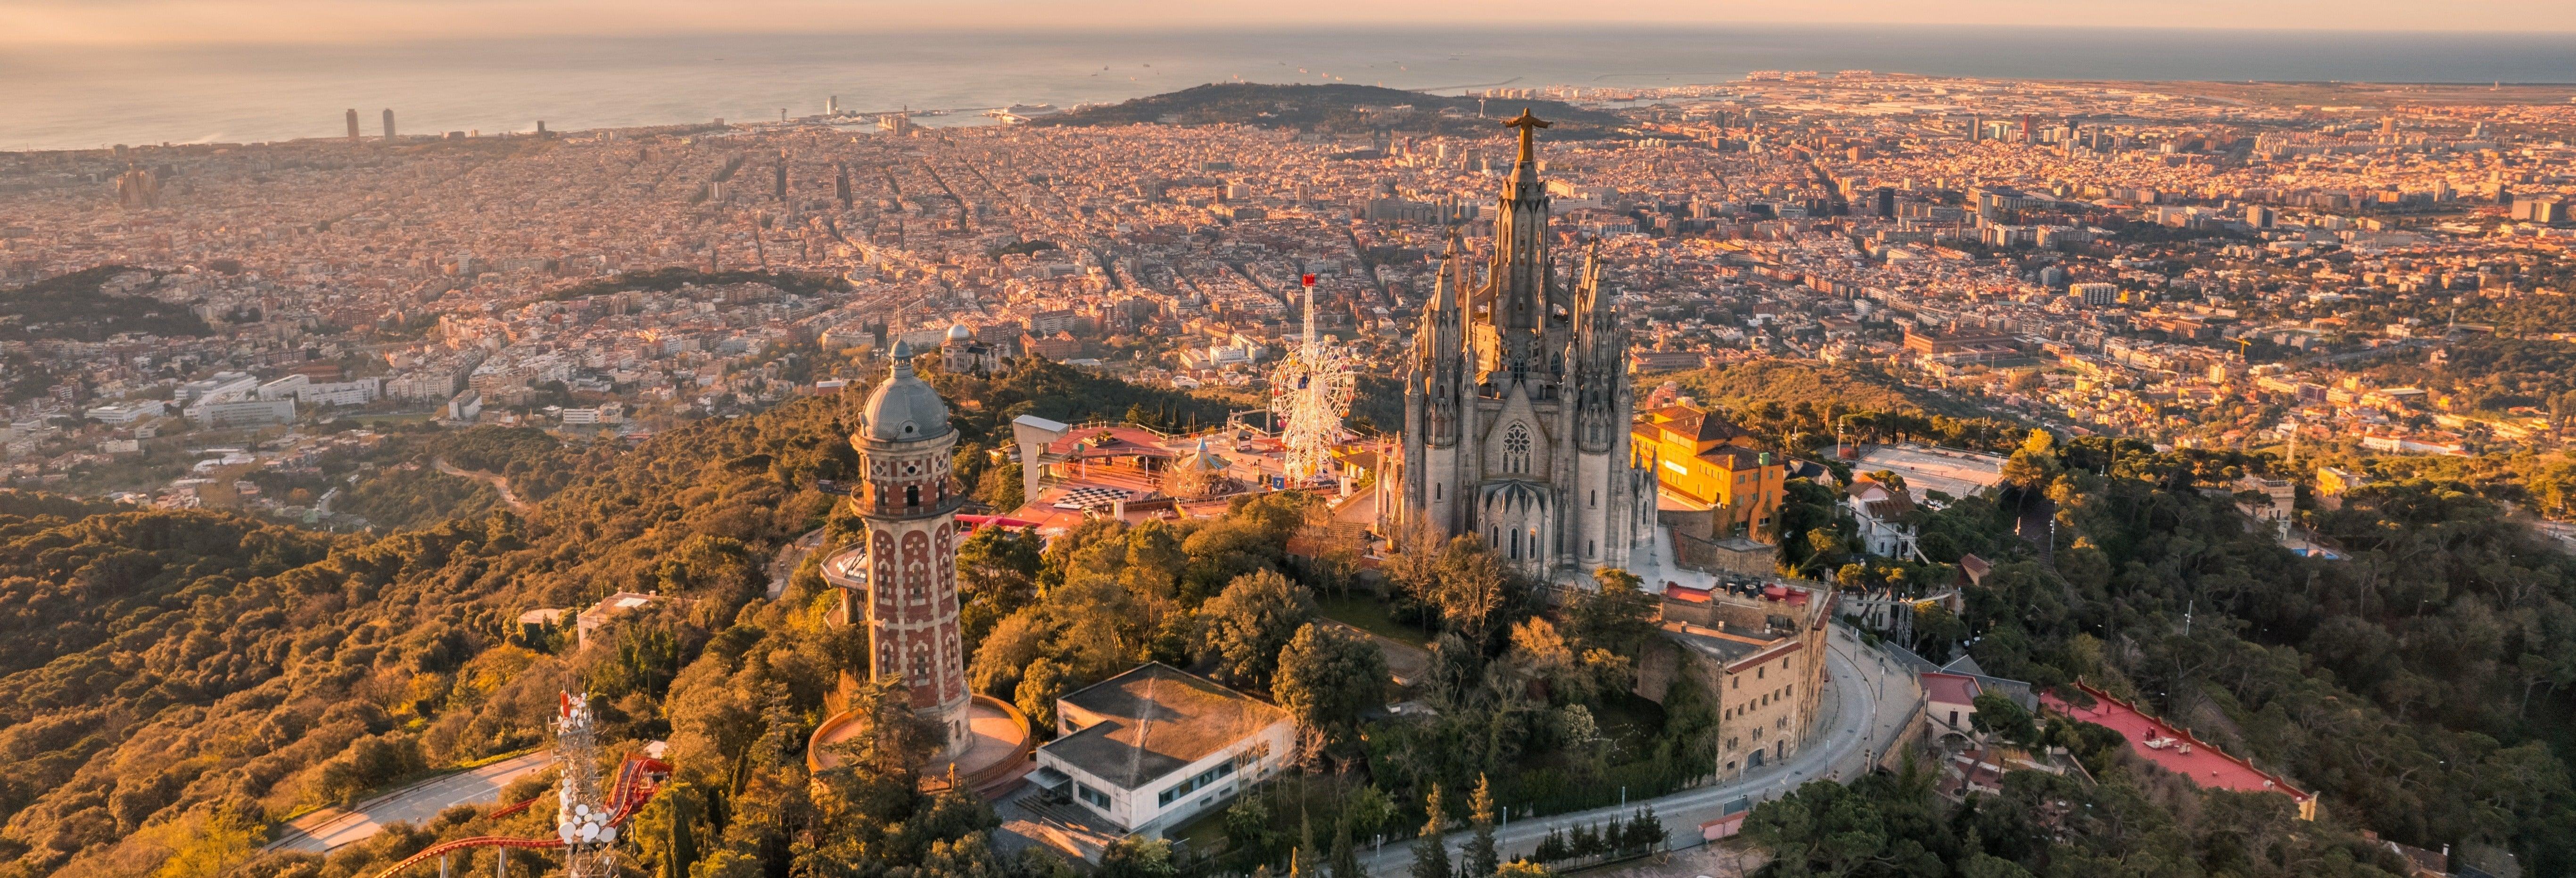 Barcelona Day Trip from Pineda de Mar